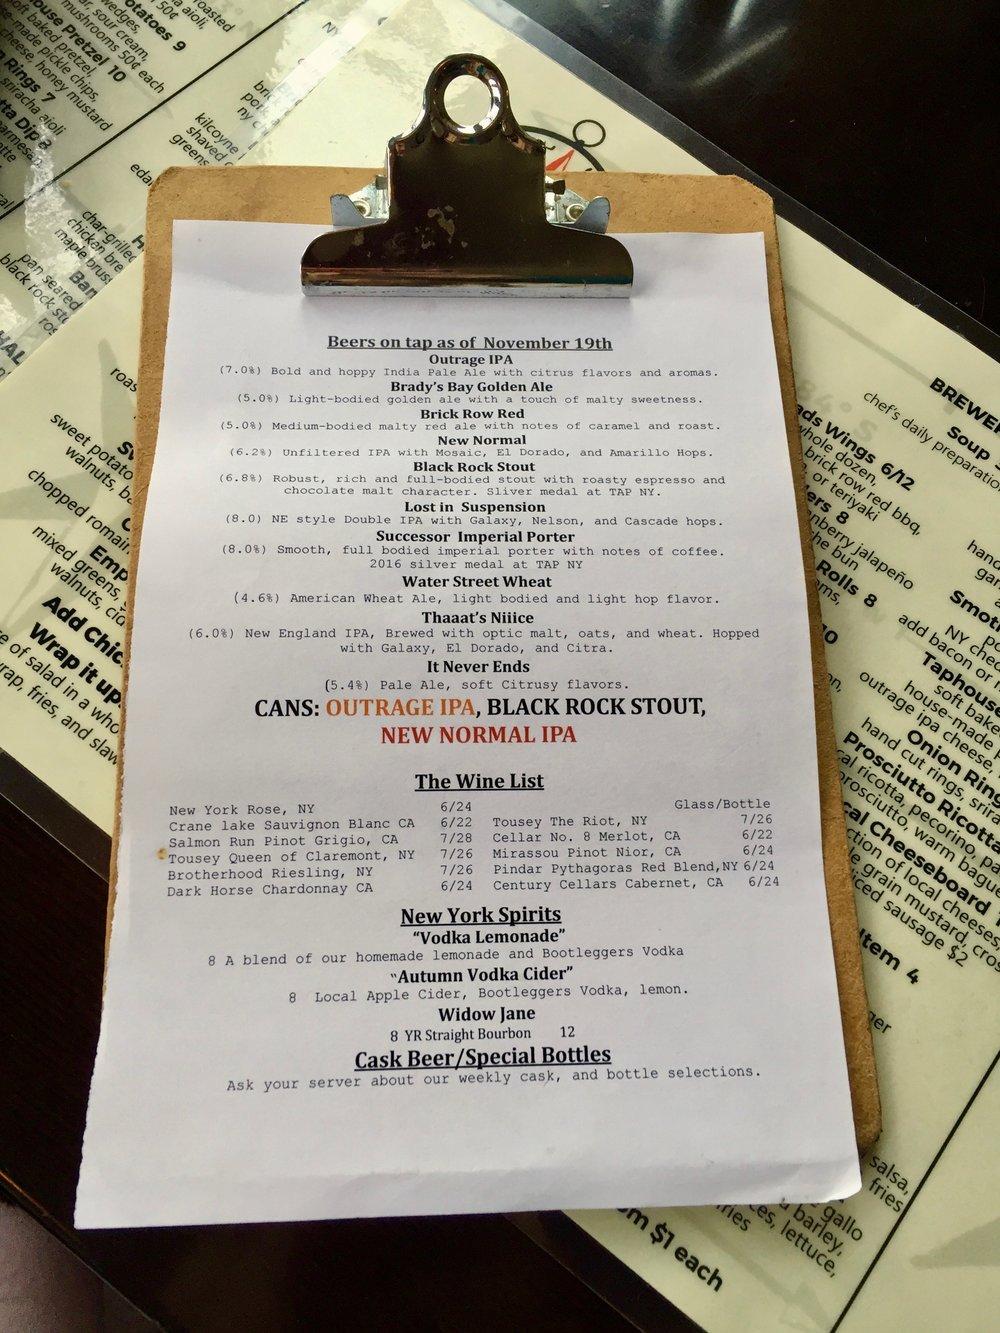 Beer menu at Crossroads Brewing in Athens, NY